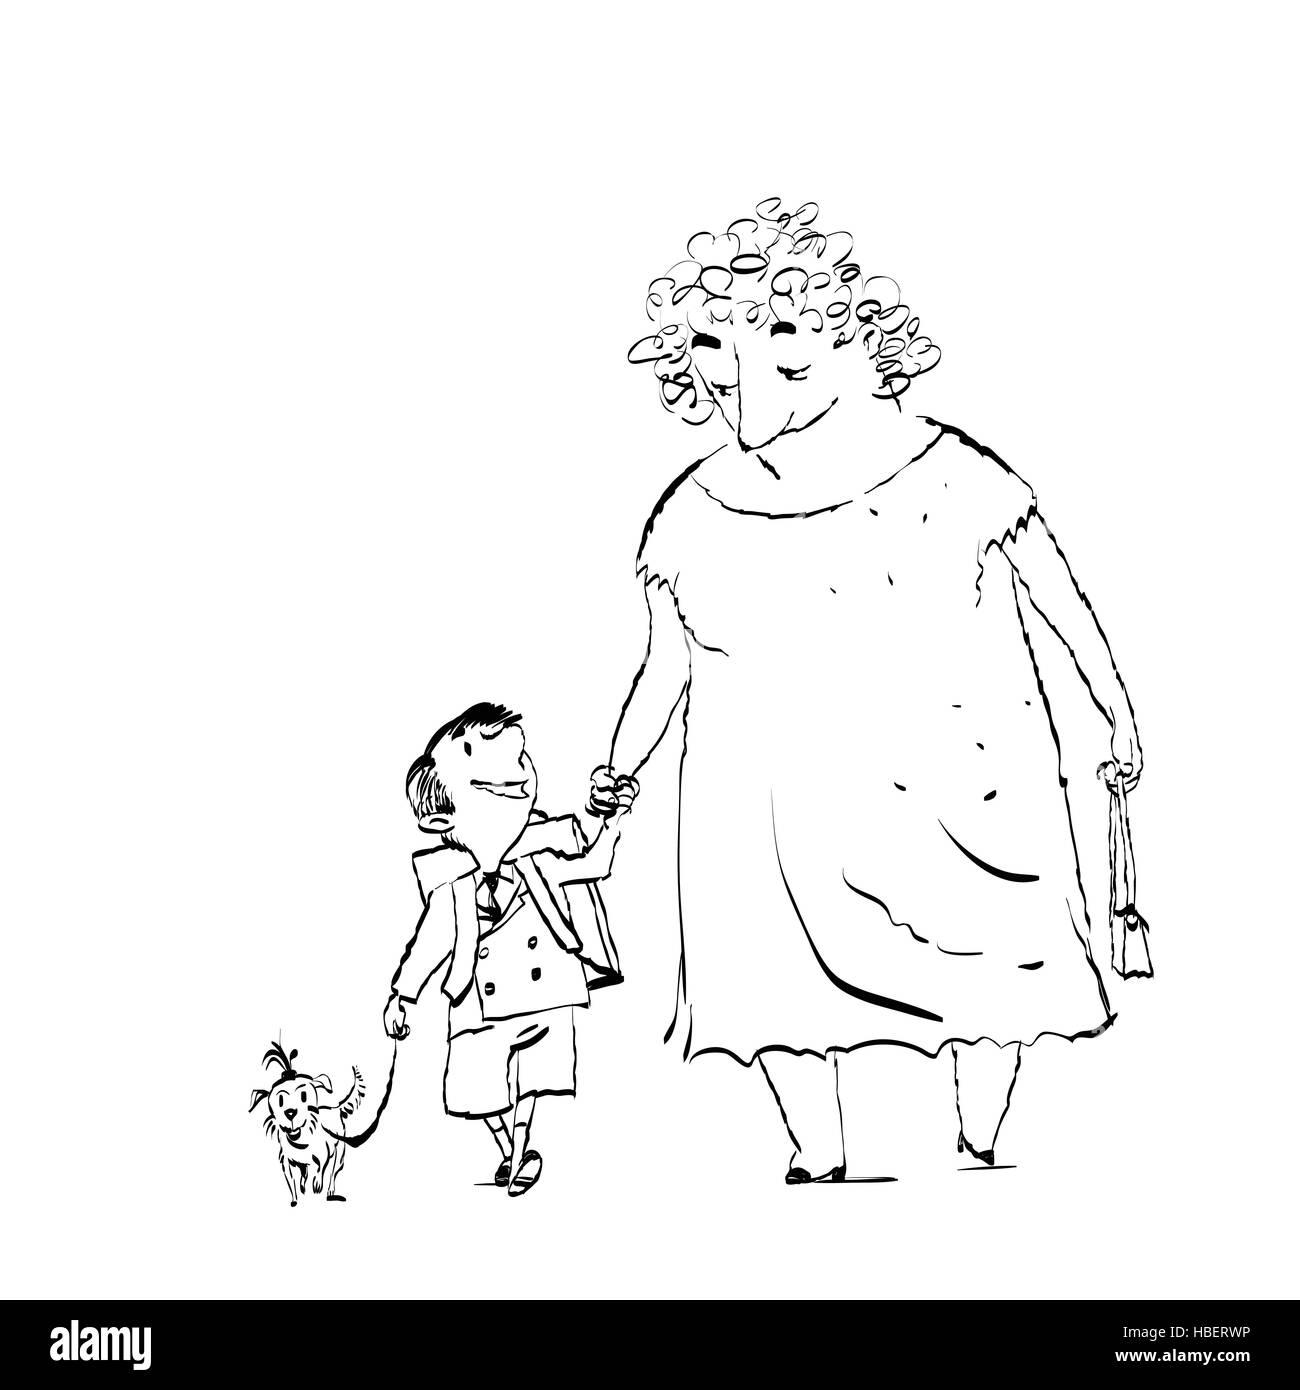 Grandma, grandson and dog on a walk - Stock Vector